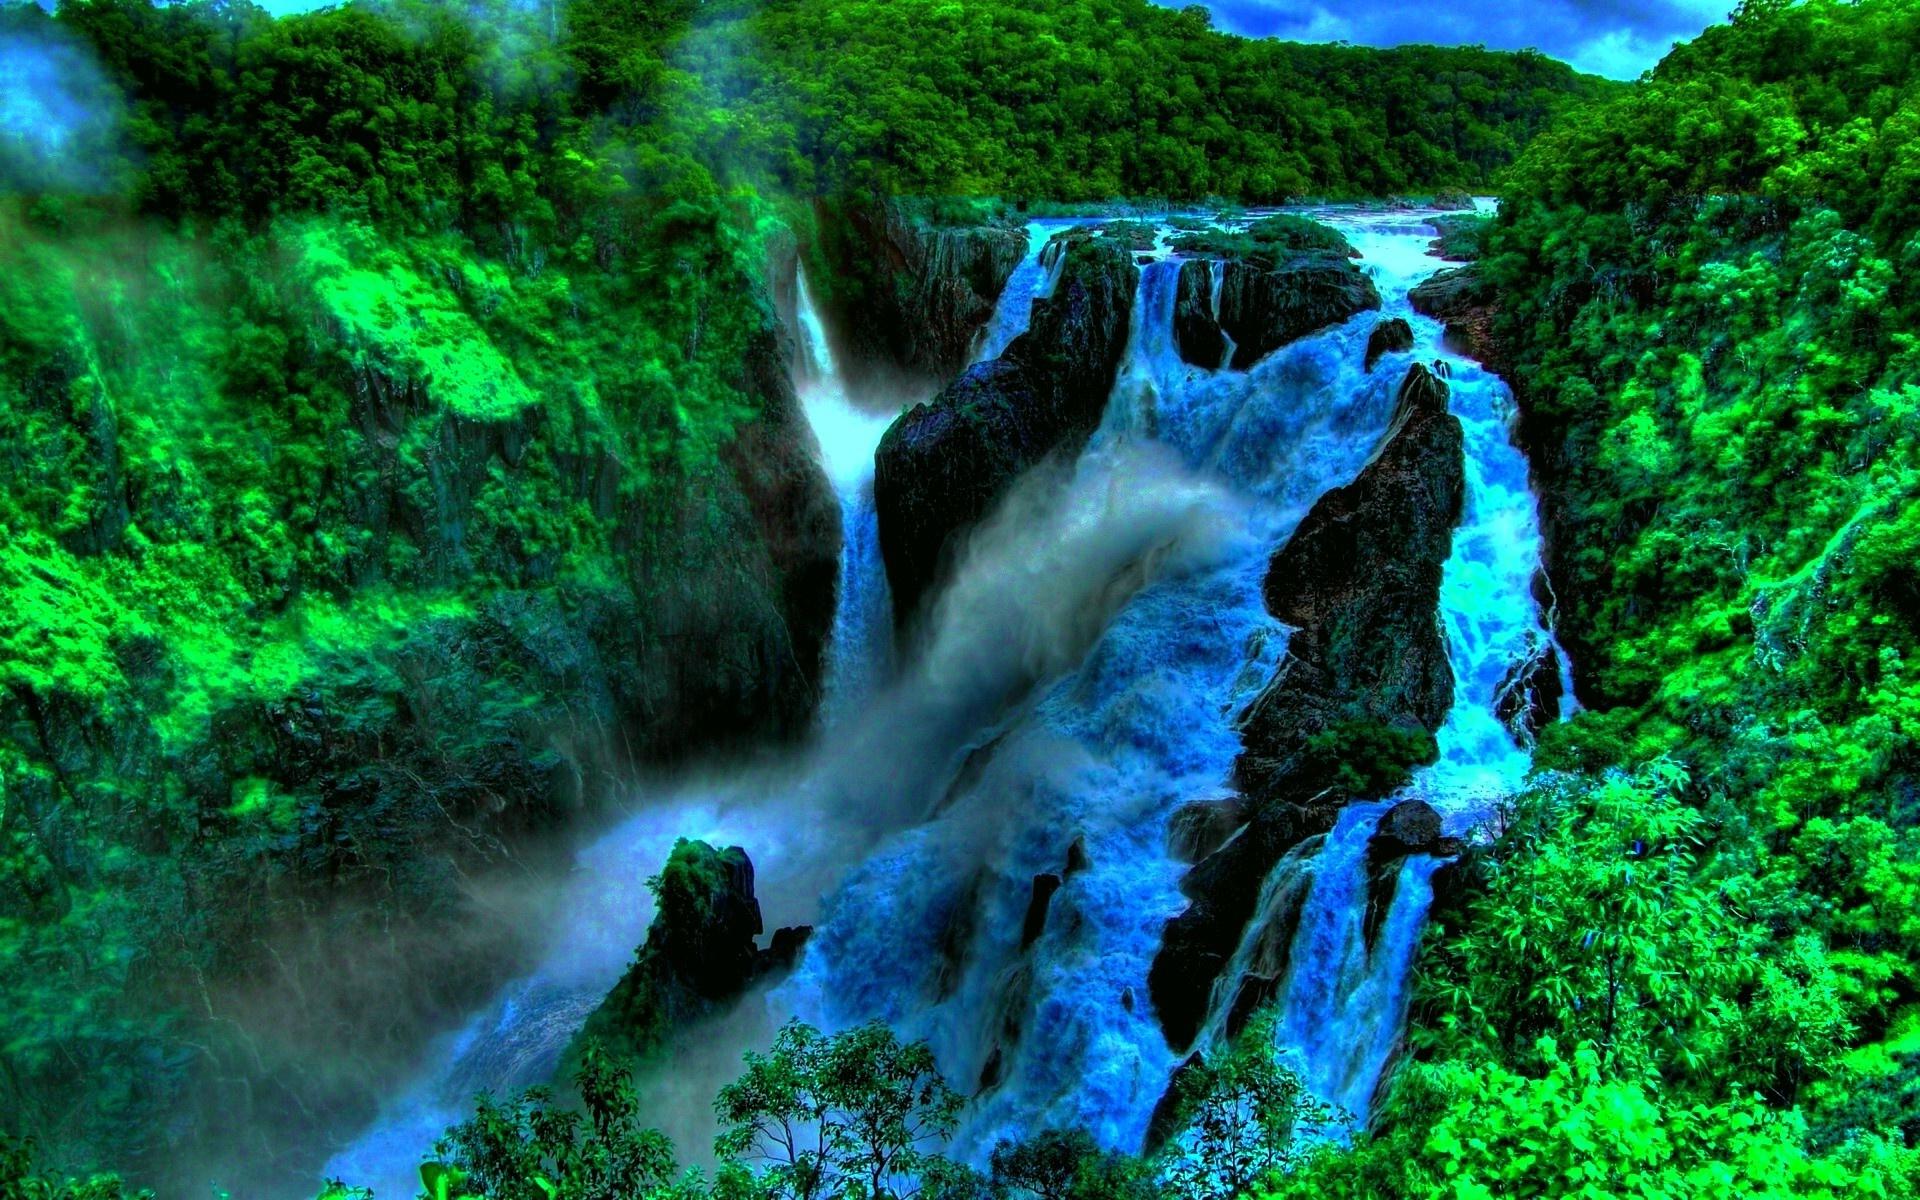 Fall Mountains Hd Wallpaper 13 Deep In The Jungle Beautiful Waterfall In Tropical Green